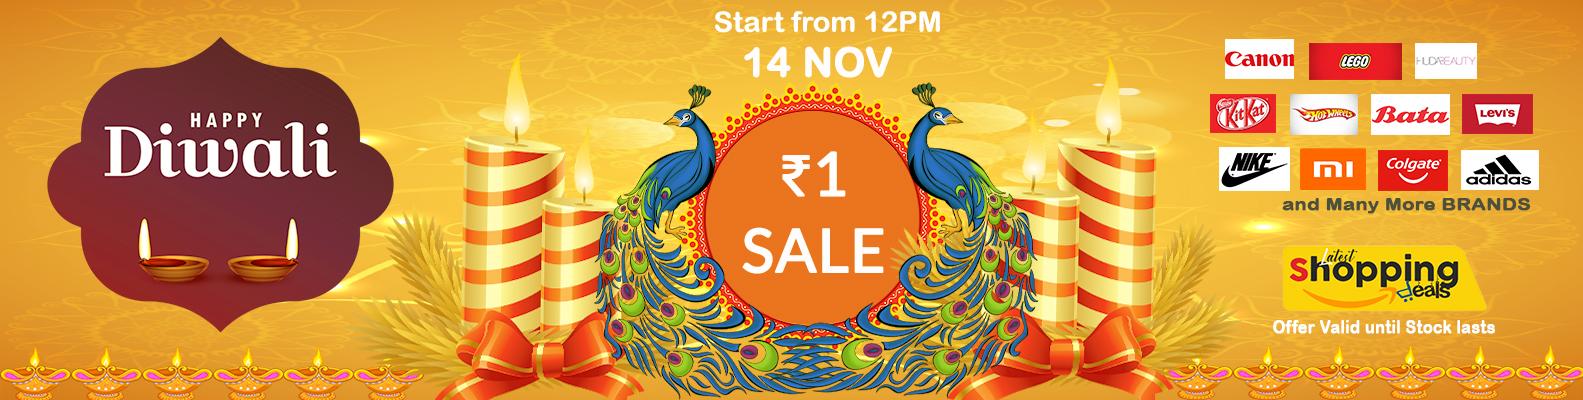 Diwali 1Rs sale, Save upto 99% on Diwali sale 2020